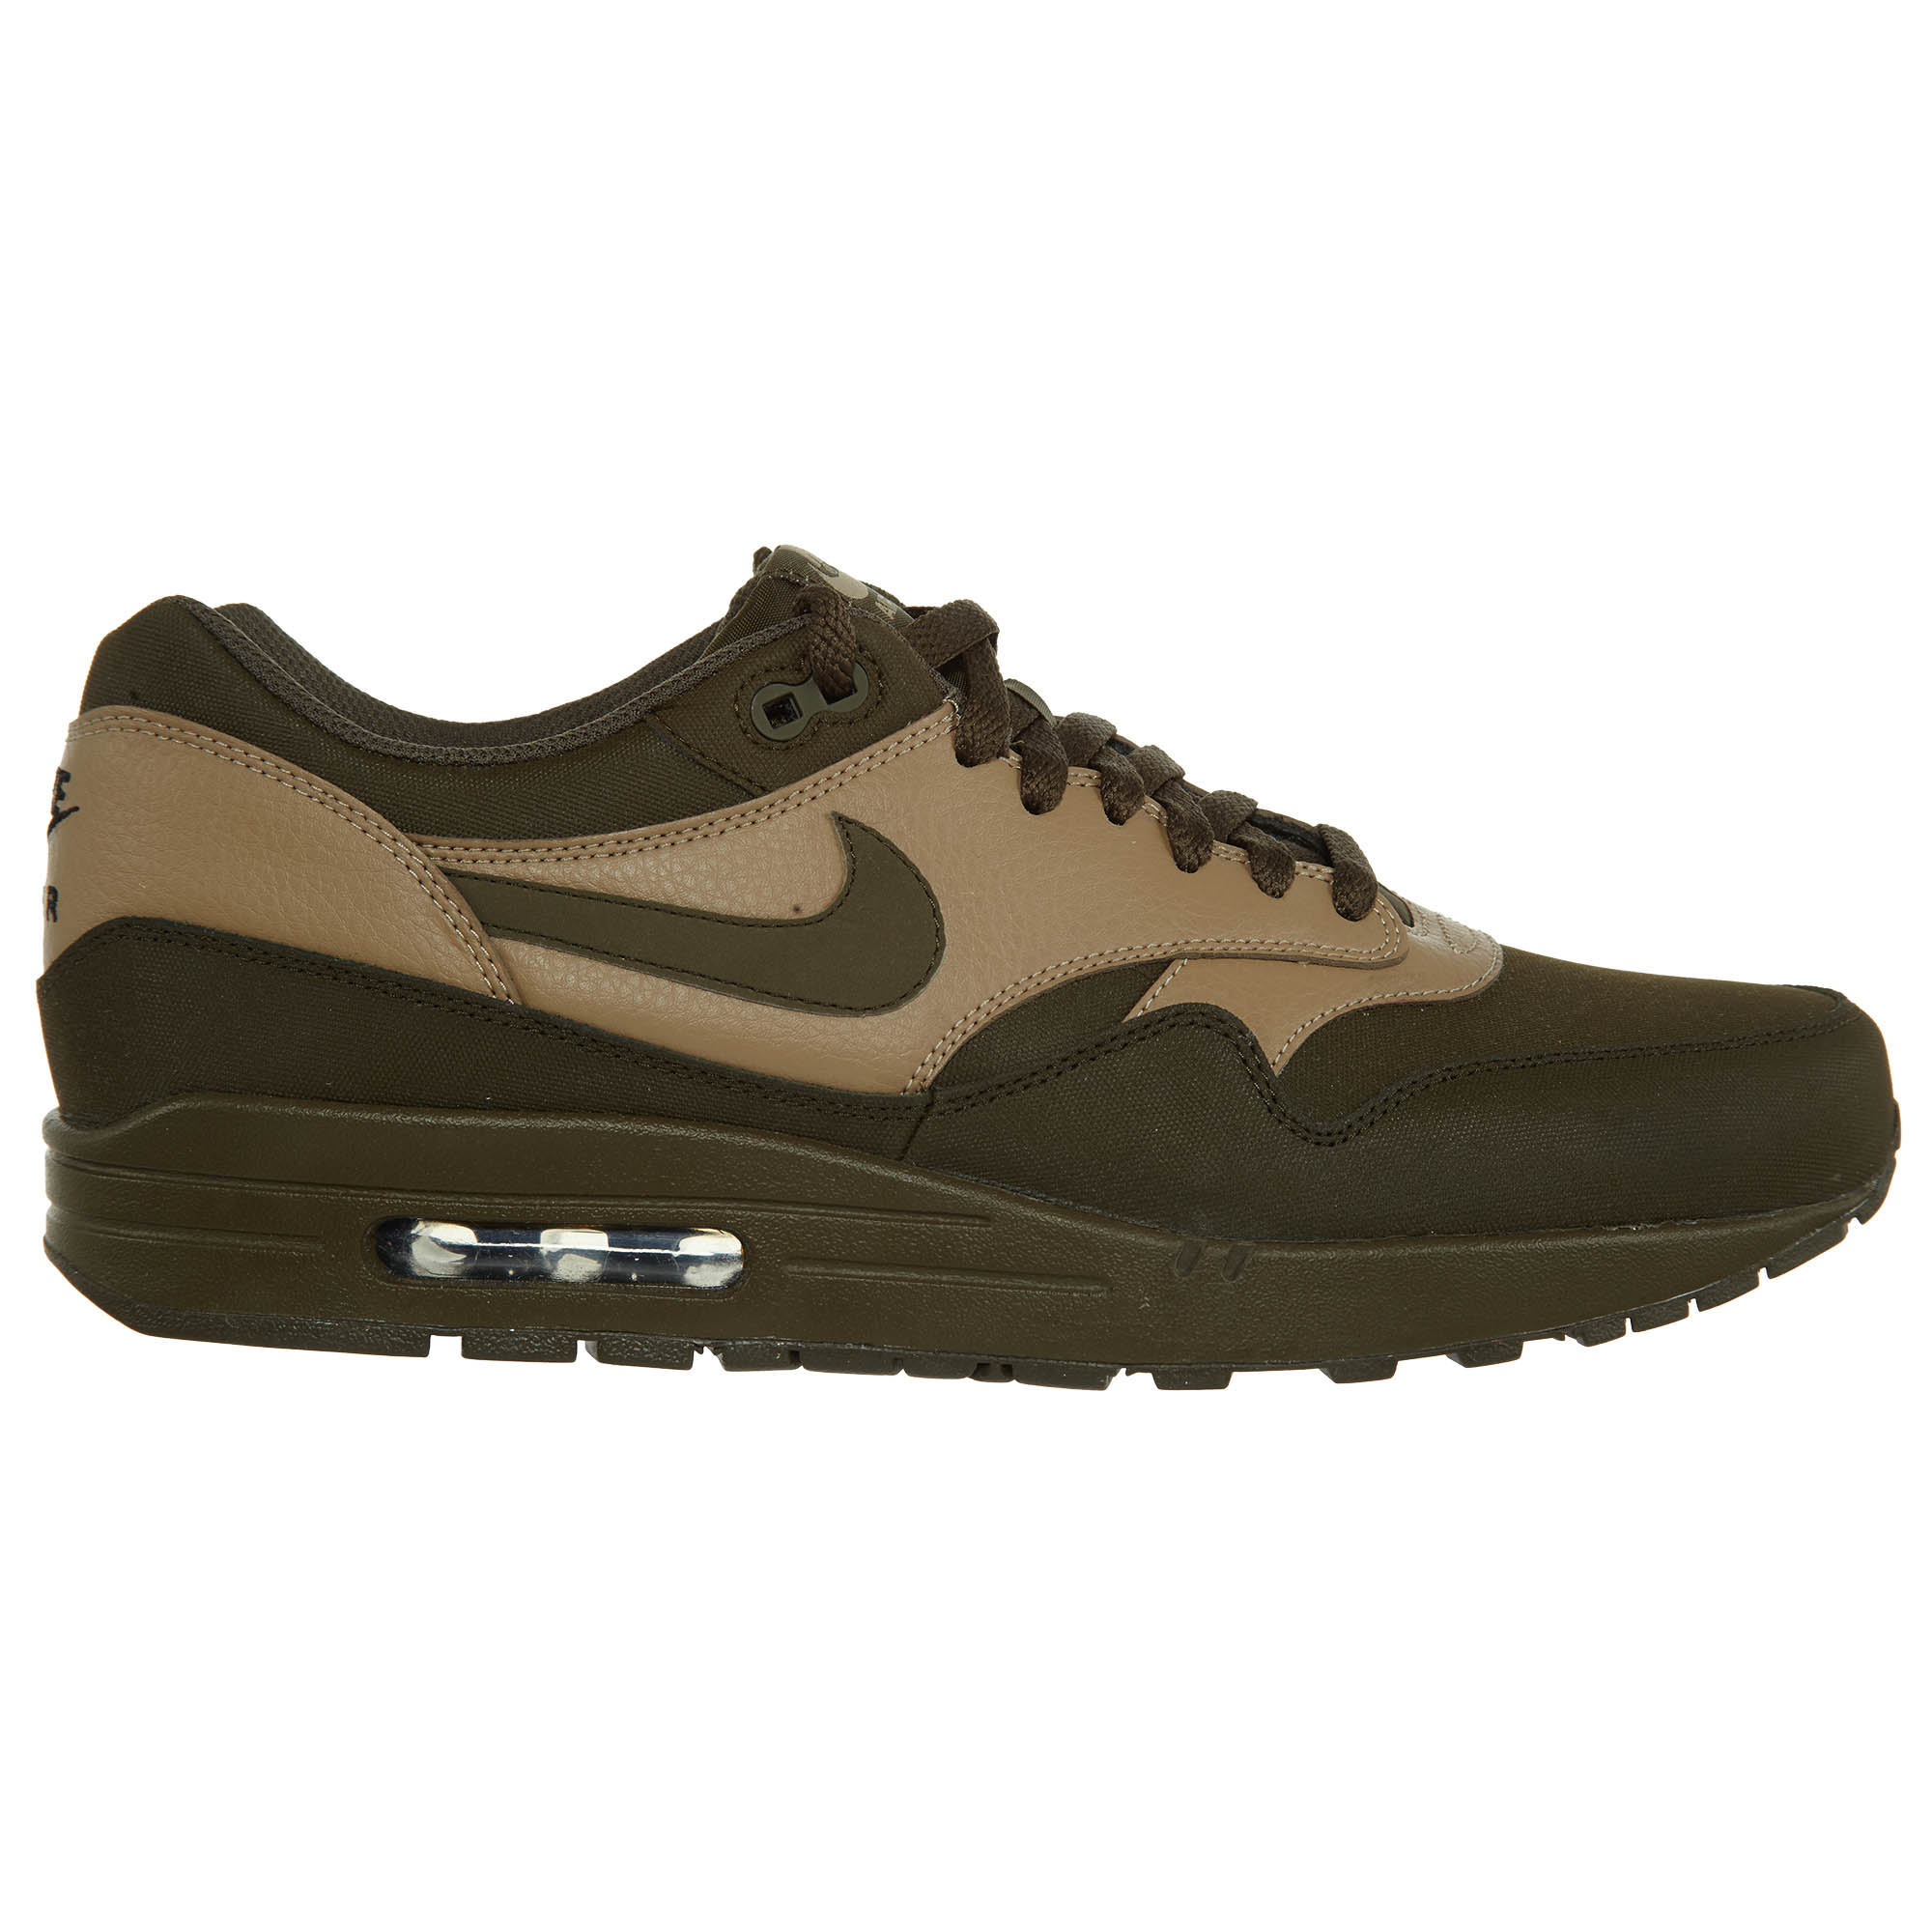 Nike Air Max 1 Ltr Premium Dark Loden/Dark Loden-Dsrt Cm-Black